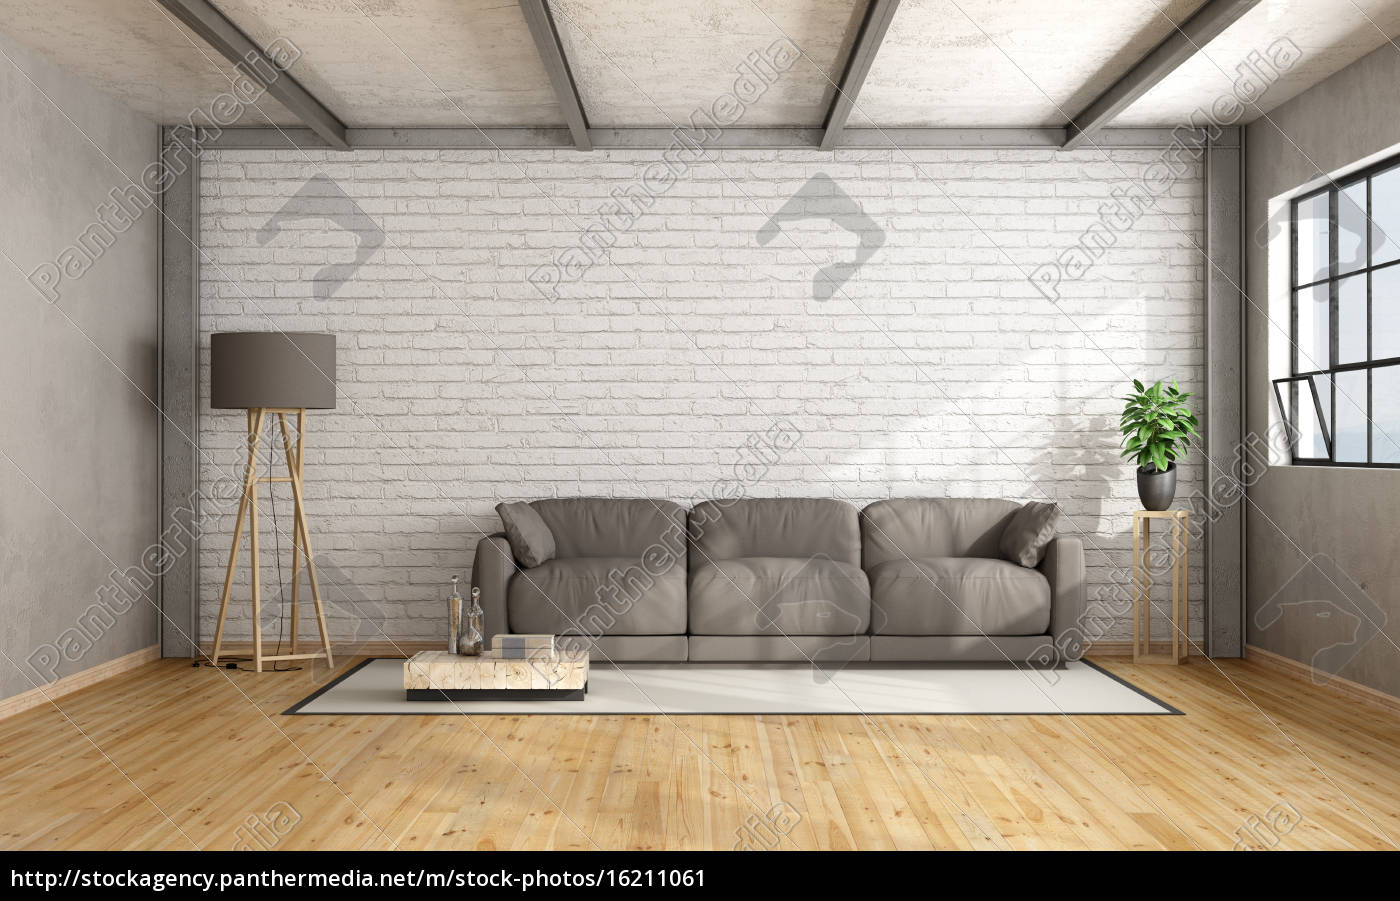 minimalistisches loft interieur - Stockfoto - #16211061 ...